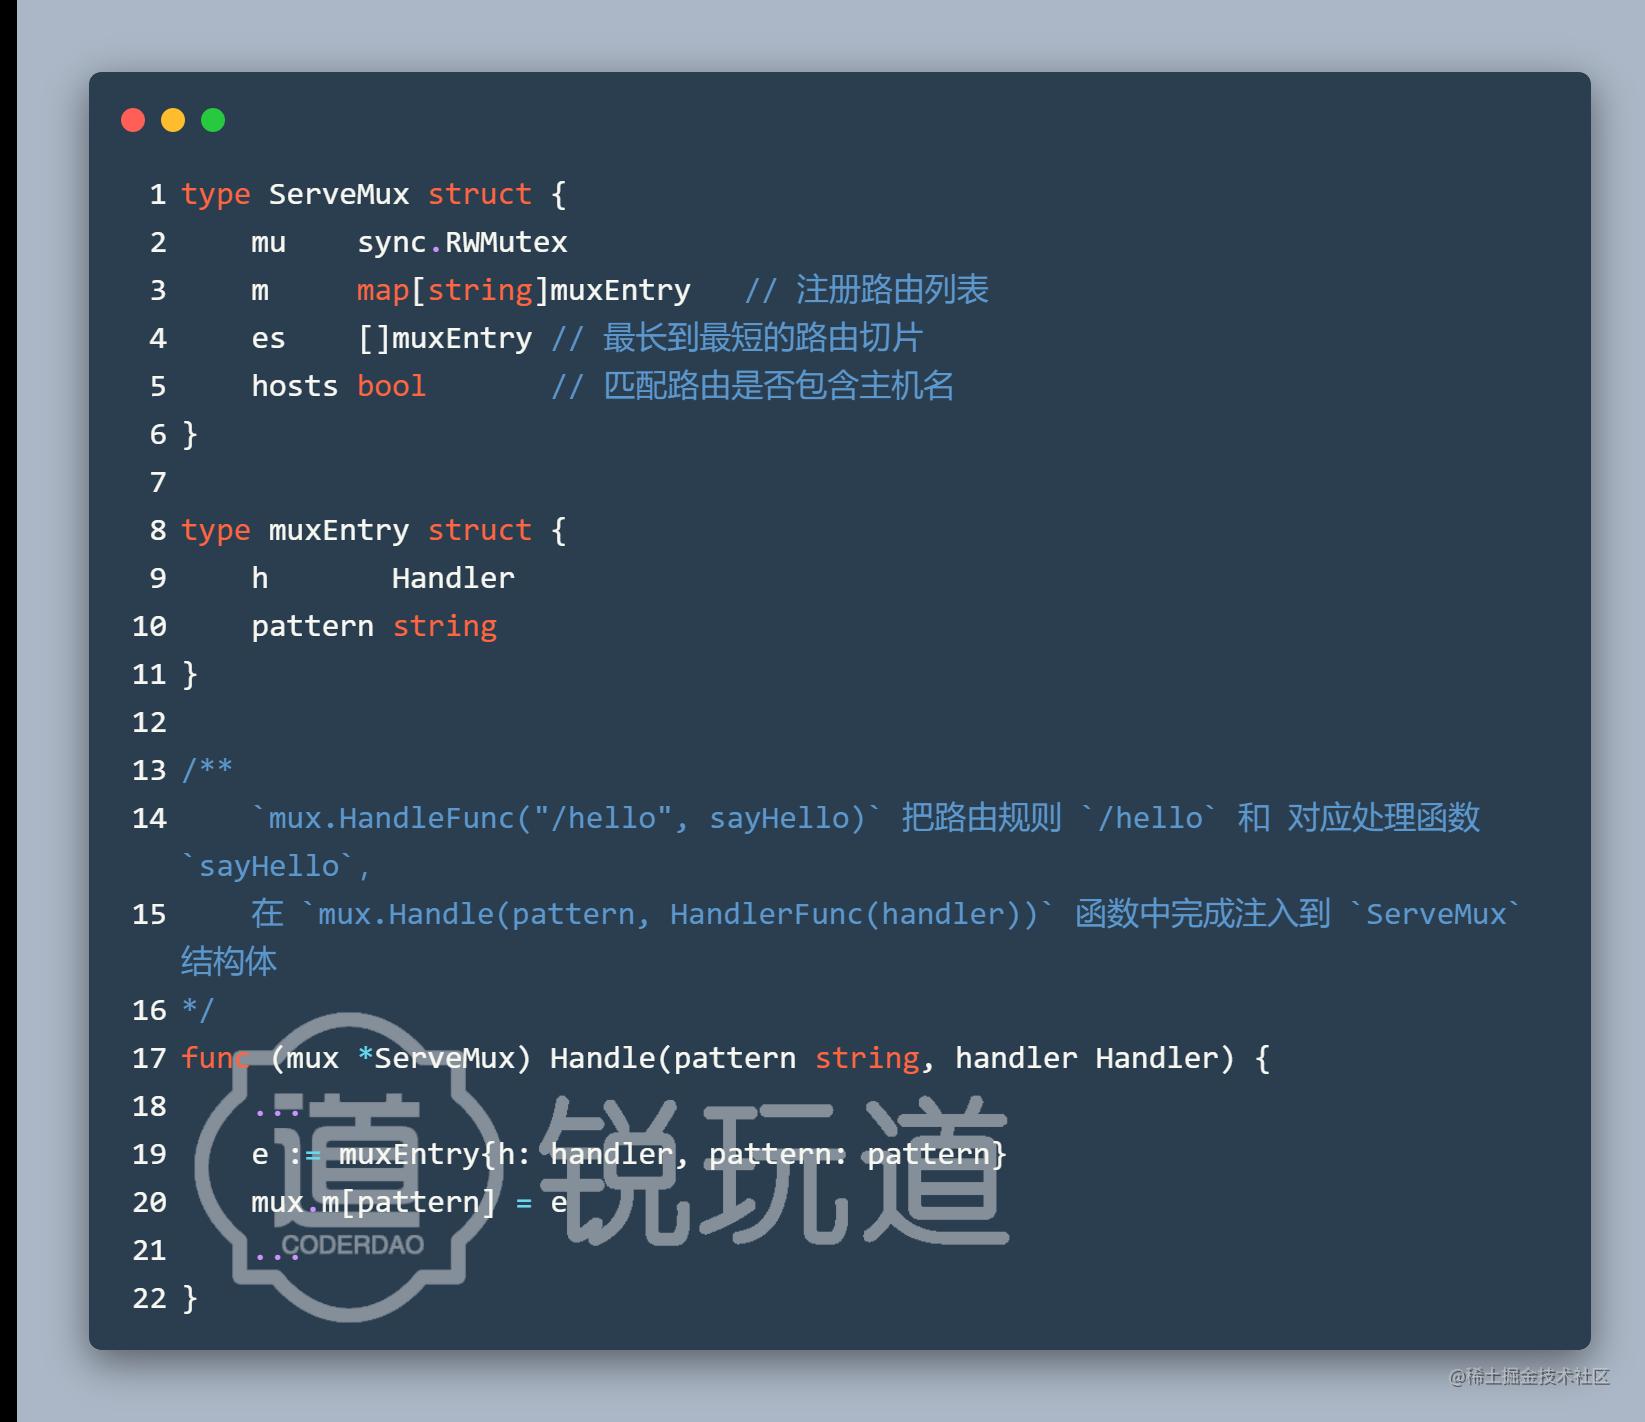 code-snapshot (1).png